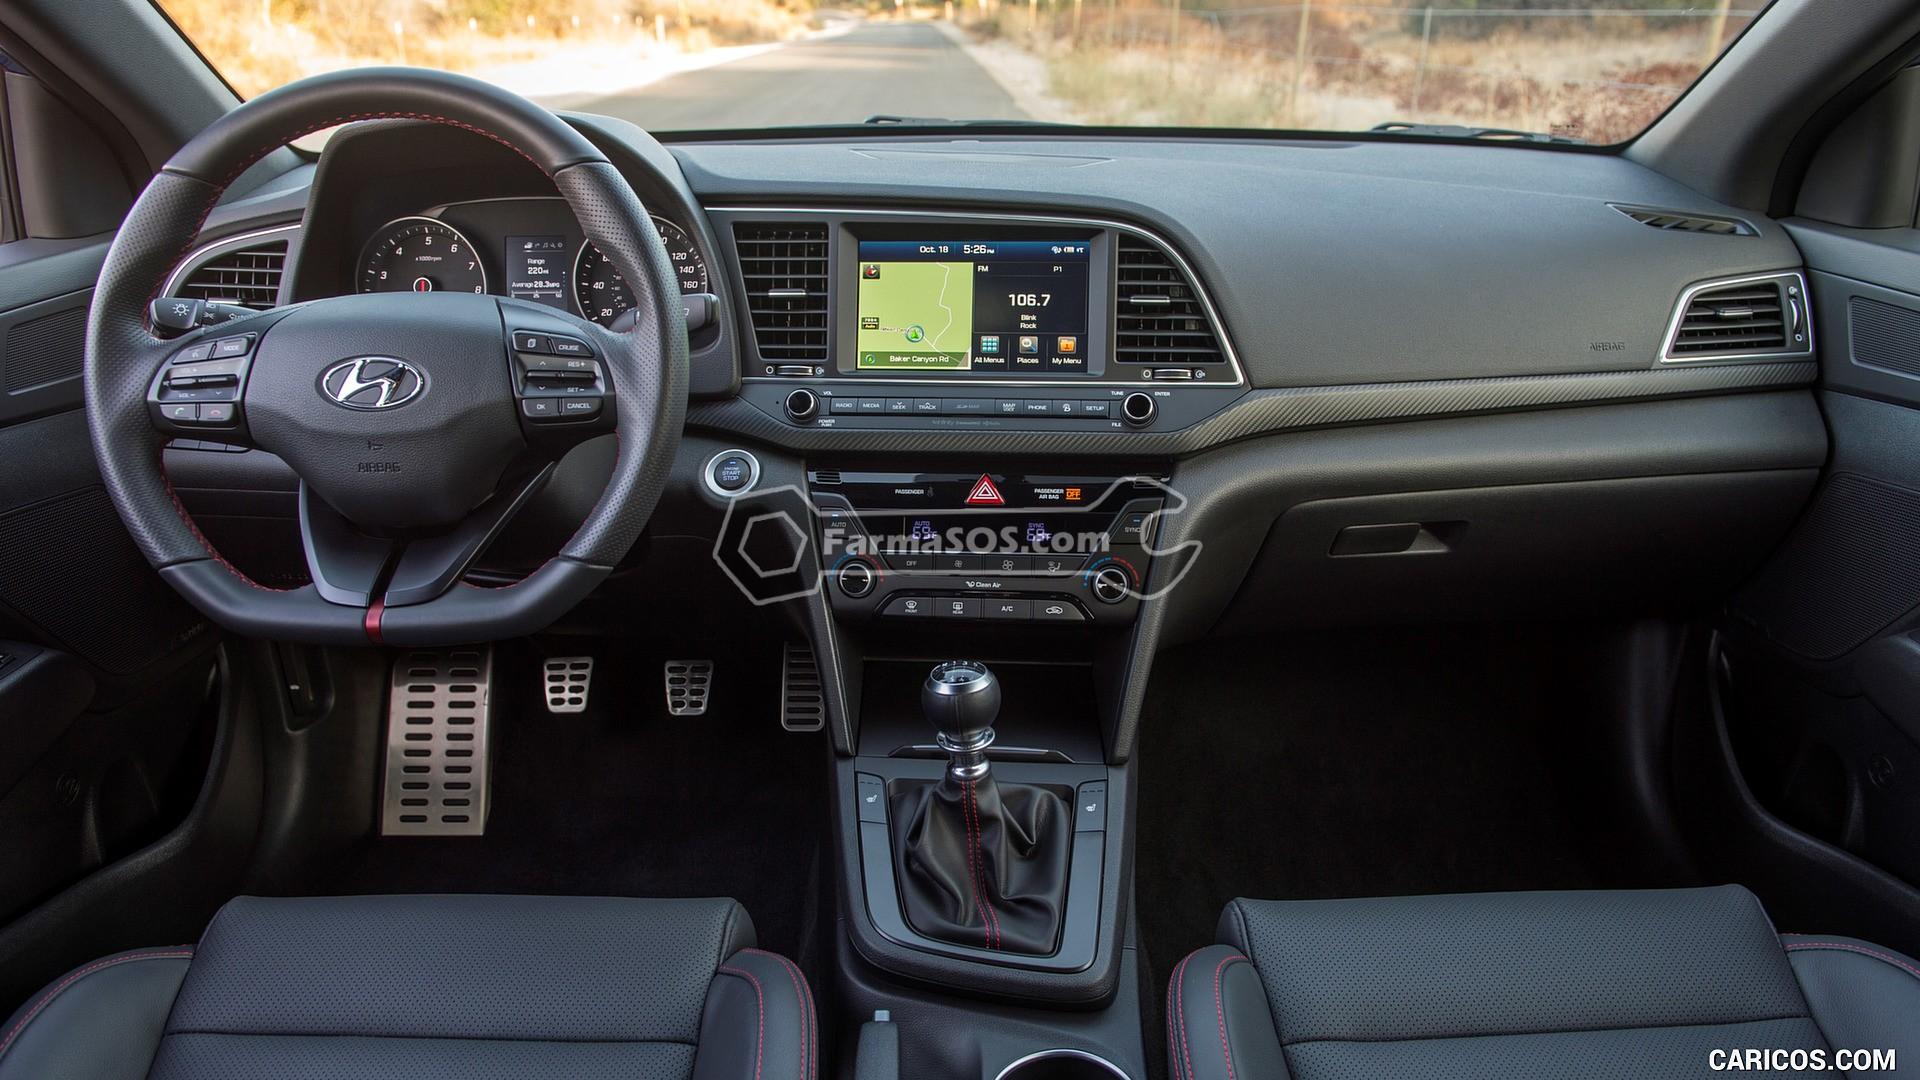 Hyundai Elantra 2016 2017 10 تصاویر هیوندای النترا مدل 2016 تا 2018